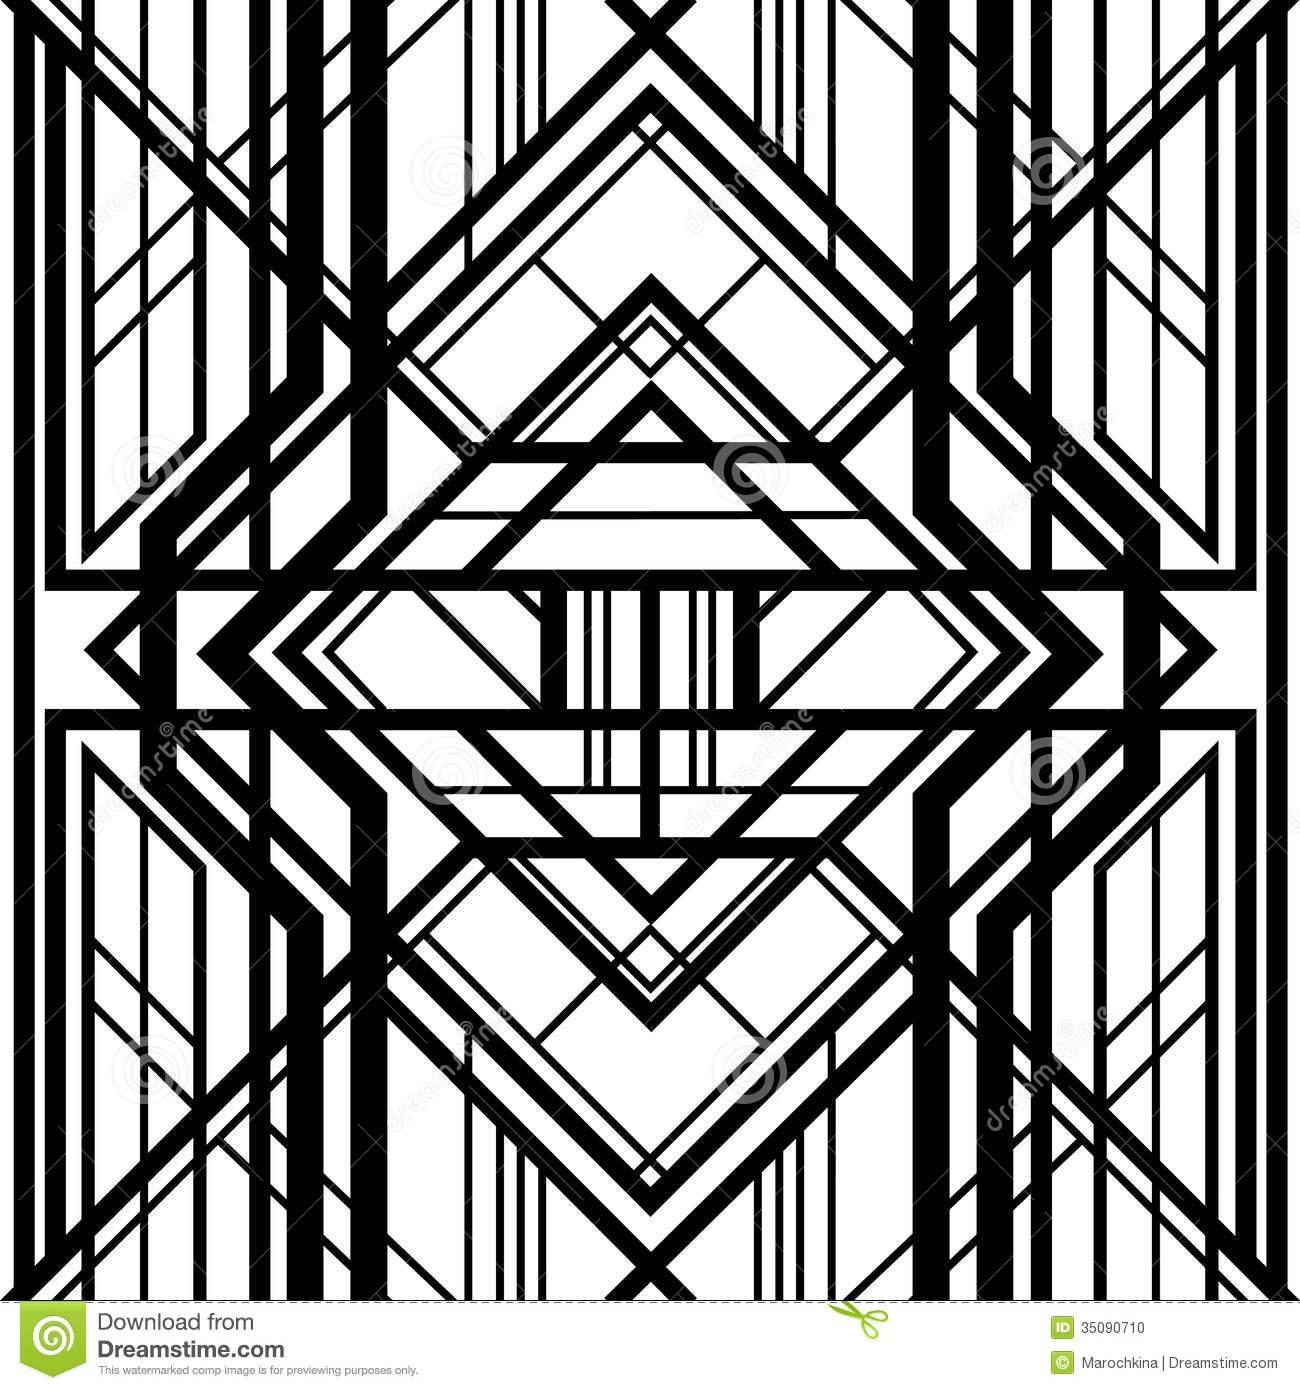 Line Art Pattern Design : Line design art graphics images abstract vector wave